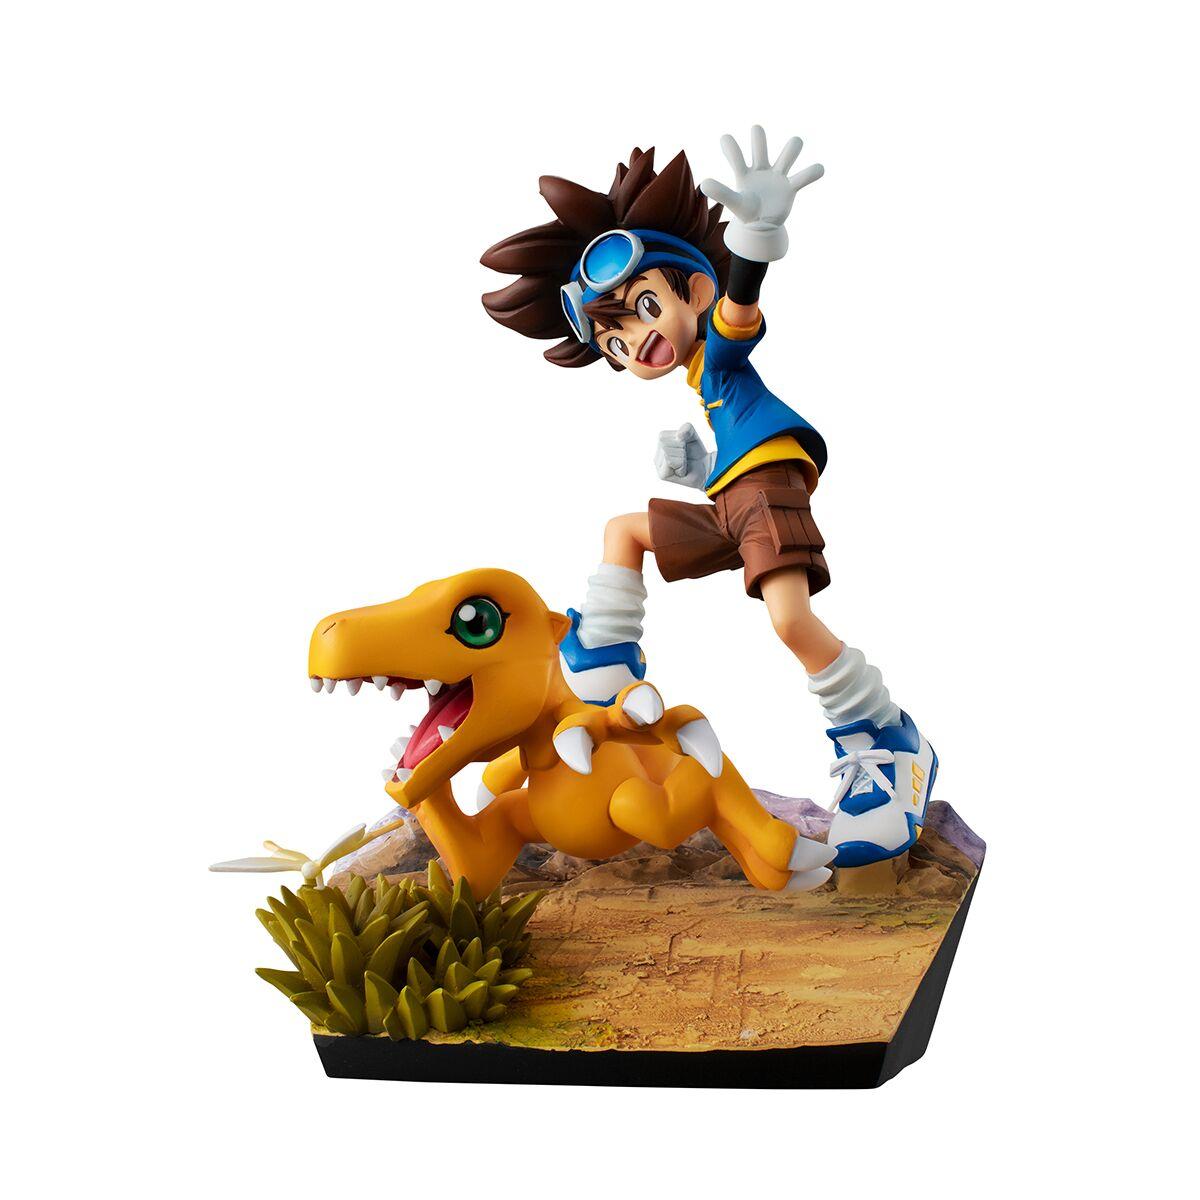 Taichi and Agumon 20th Anniversary Ver Digimon GEM Series Figure